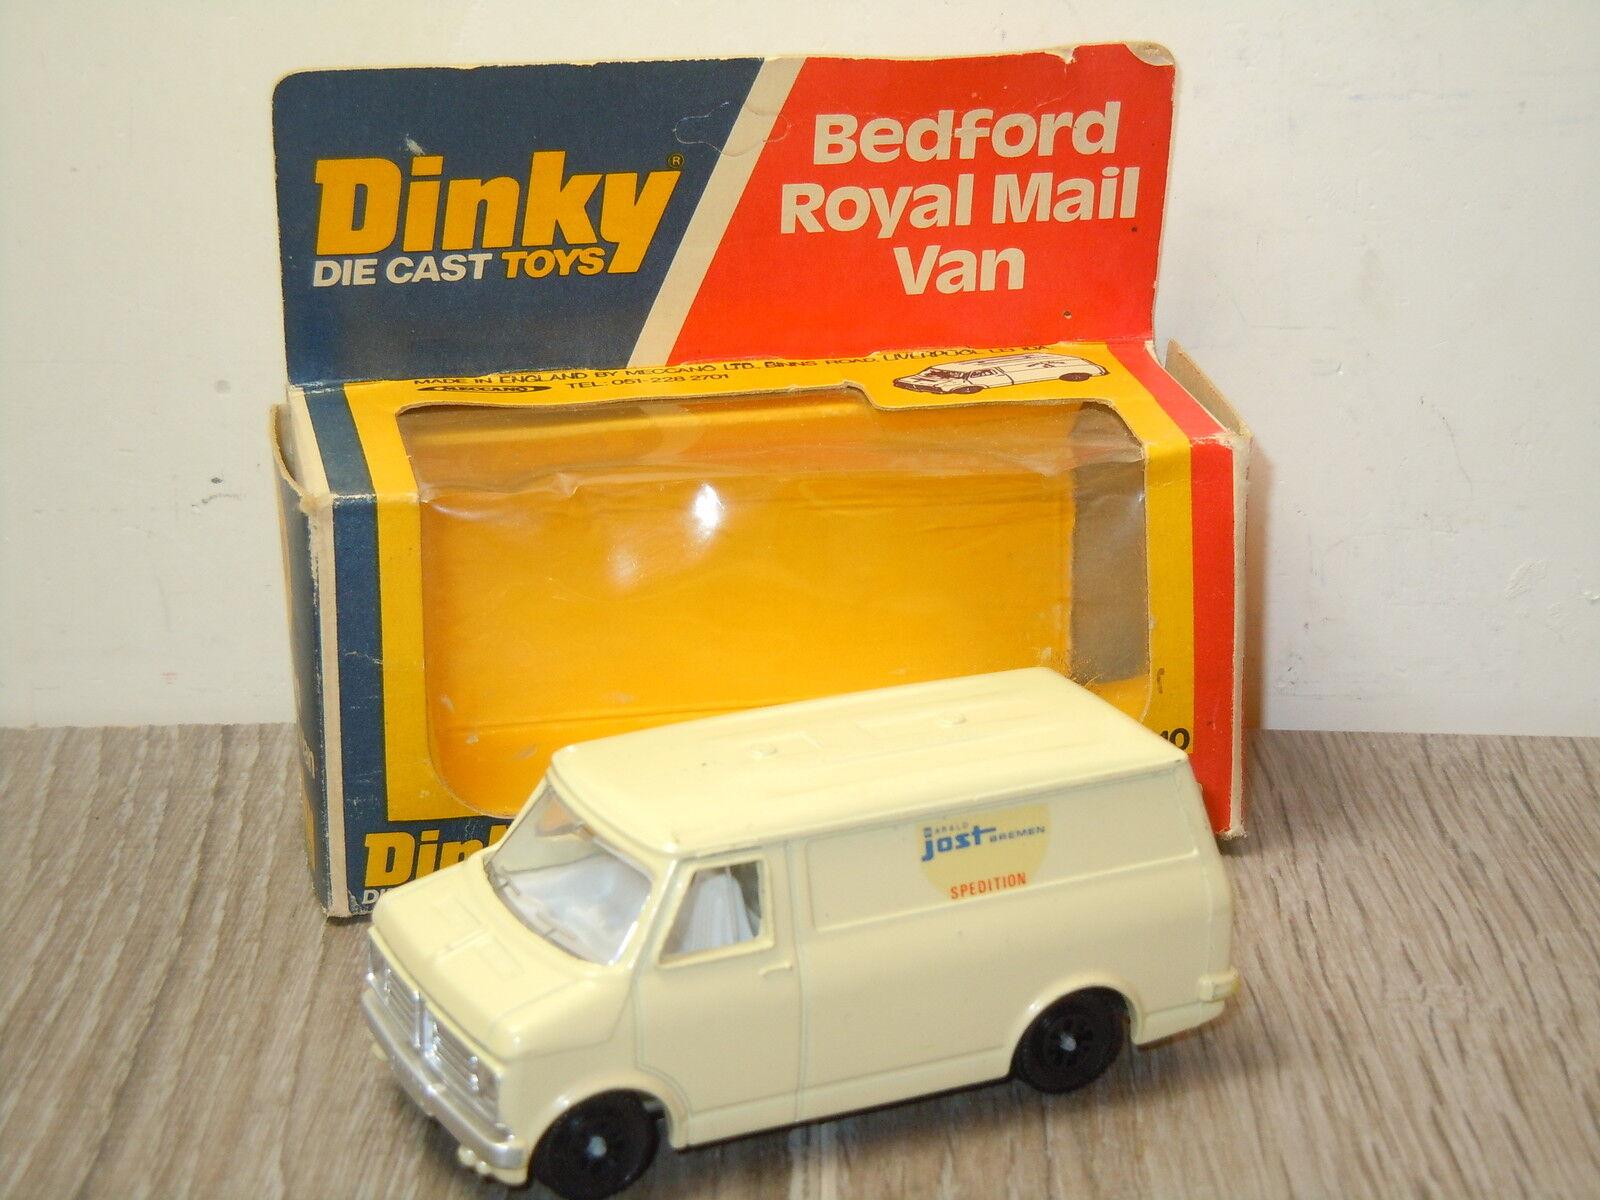 Bedford Harald Jost Bremen Van Dinky Toys CODE 2 John Gay In Box  15911